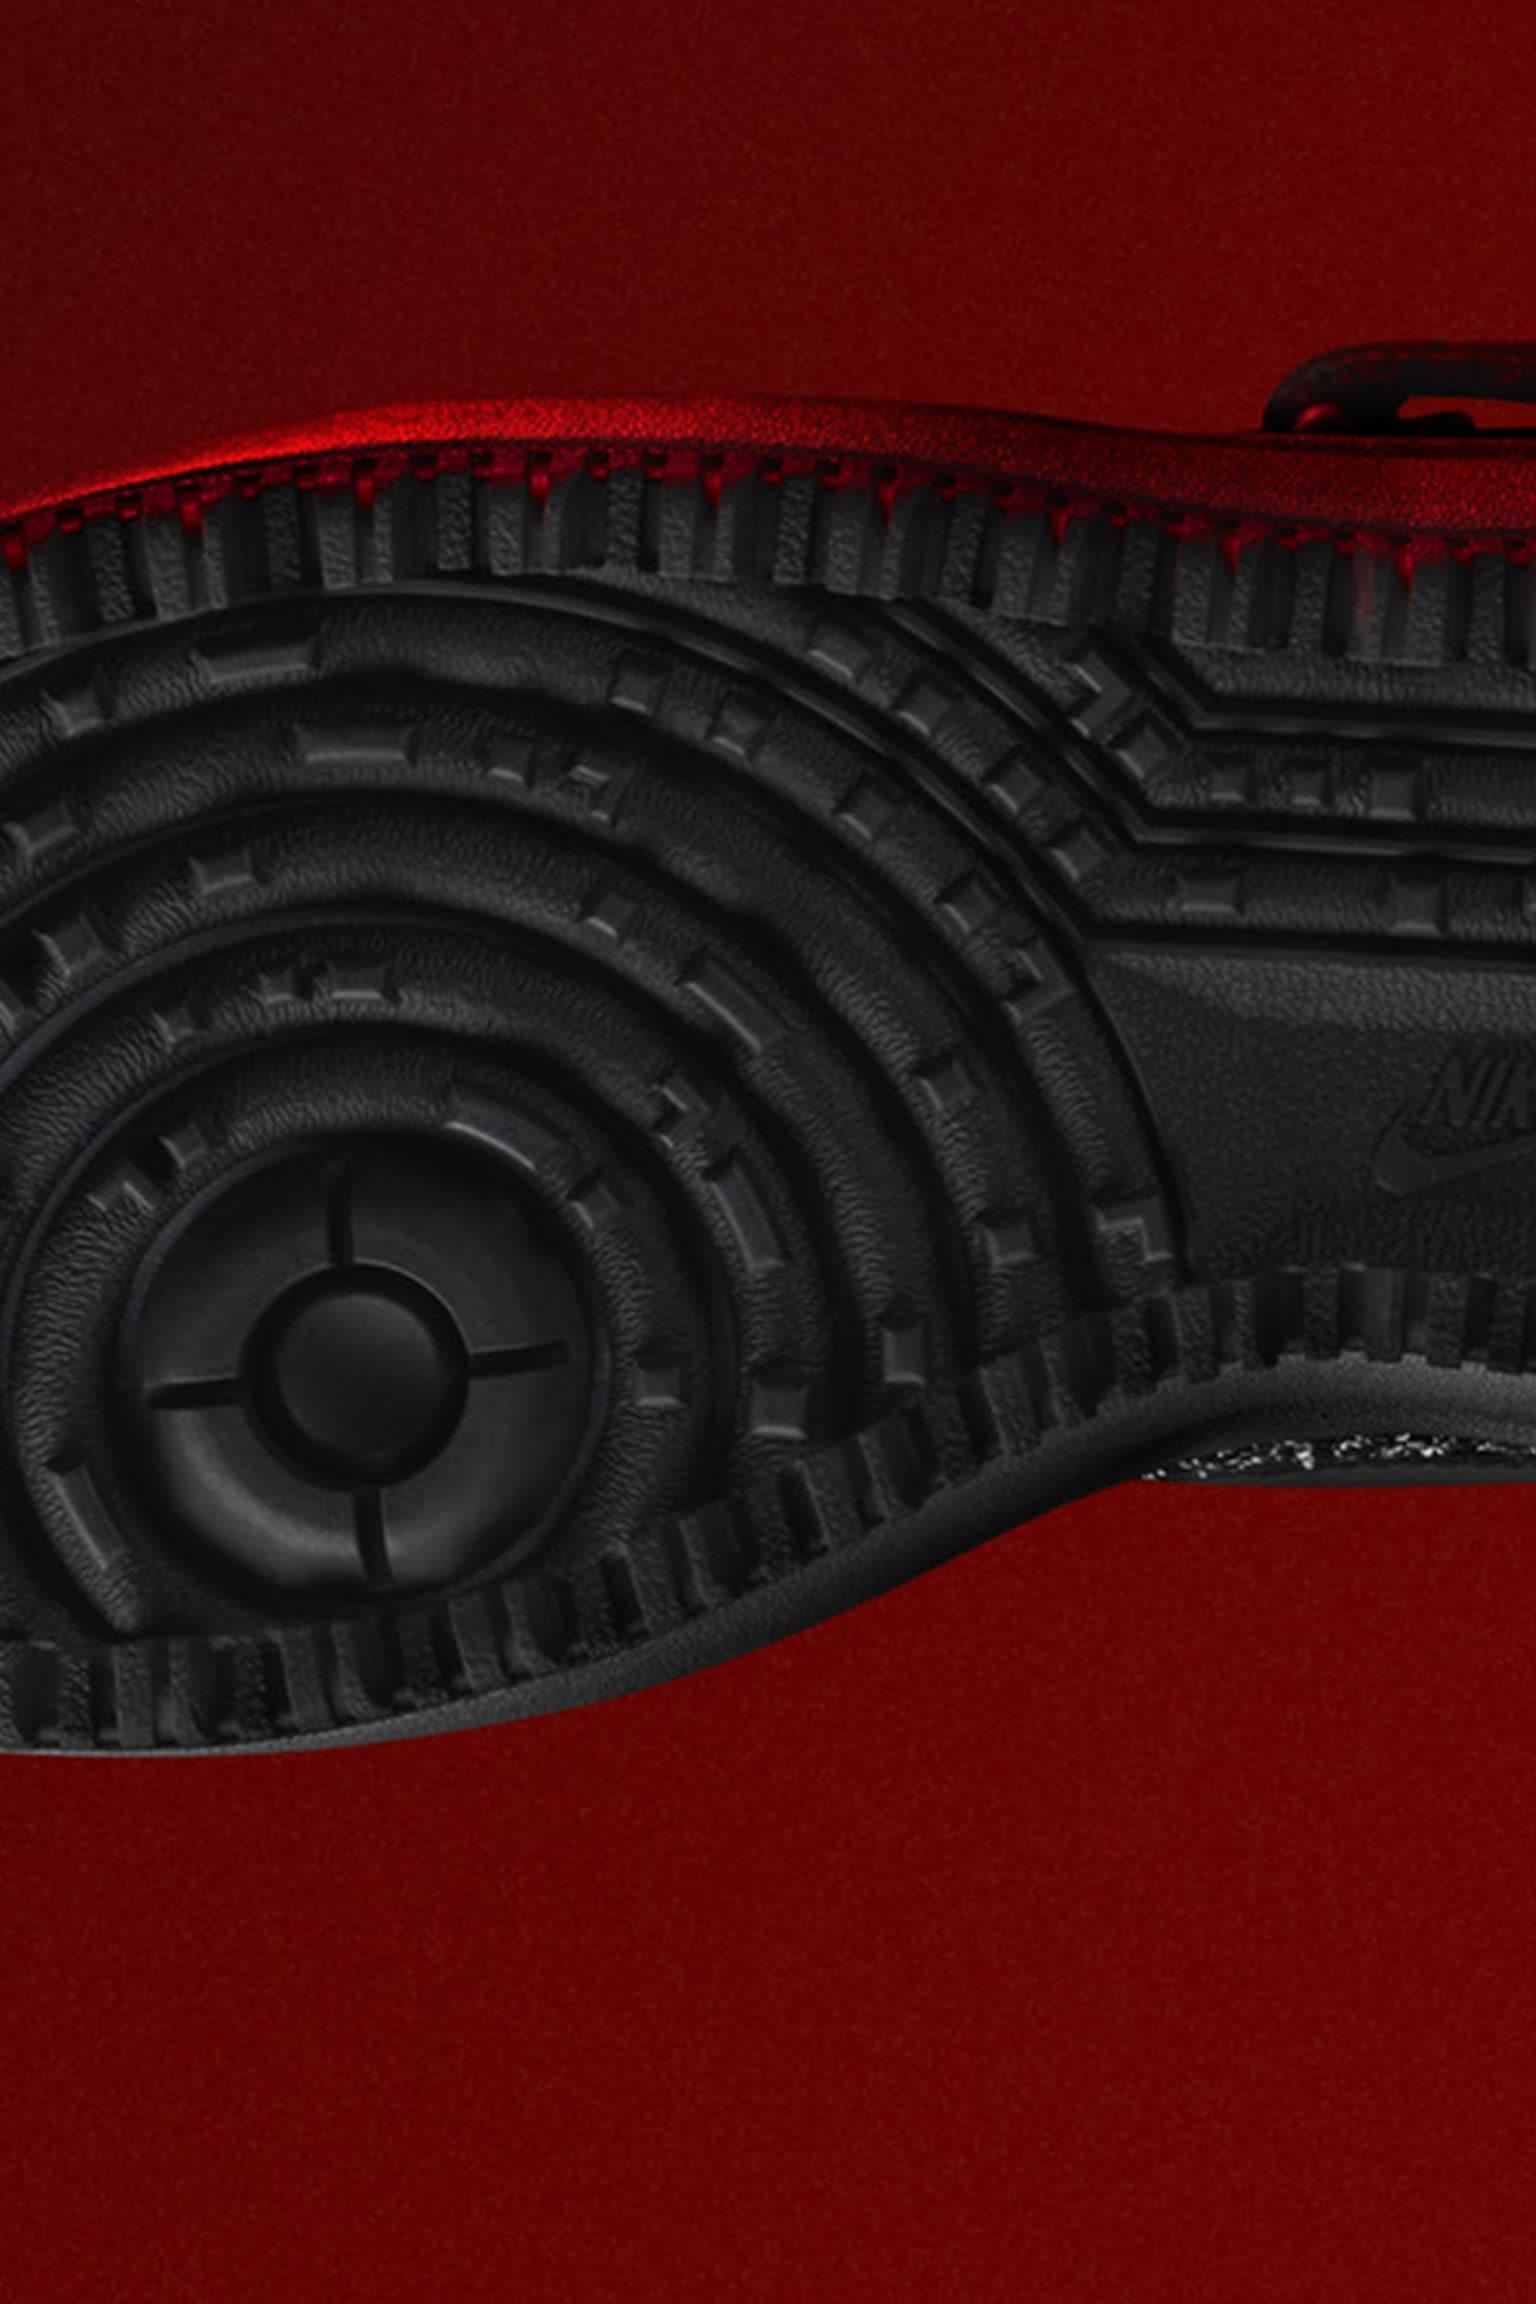 "Buty damskie Nike Lunar Force 1 Flyknit Workboot ""Black & White"". Data premiery"